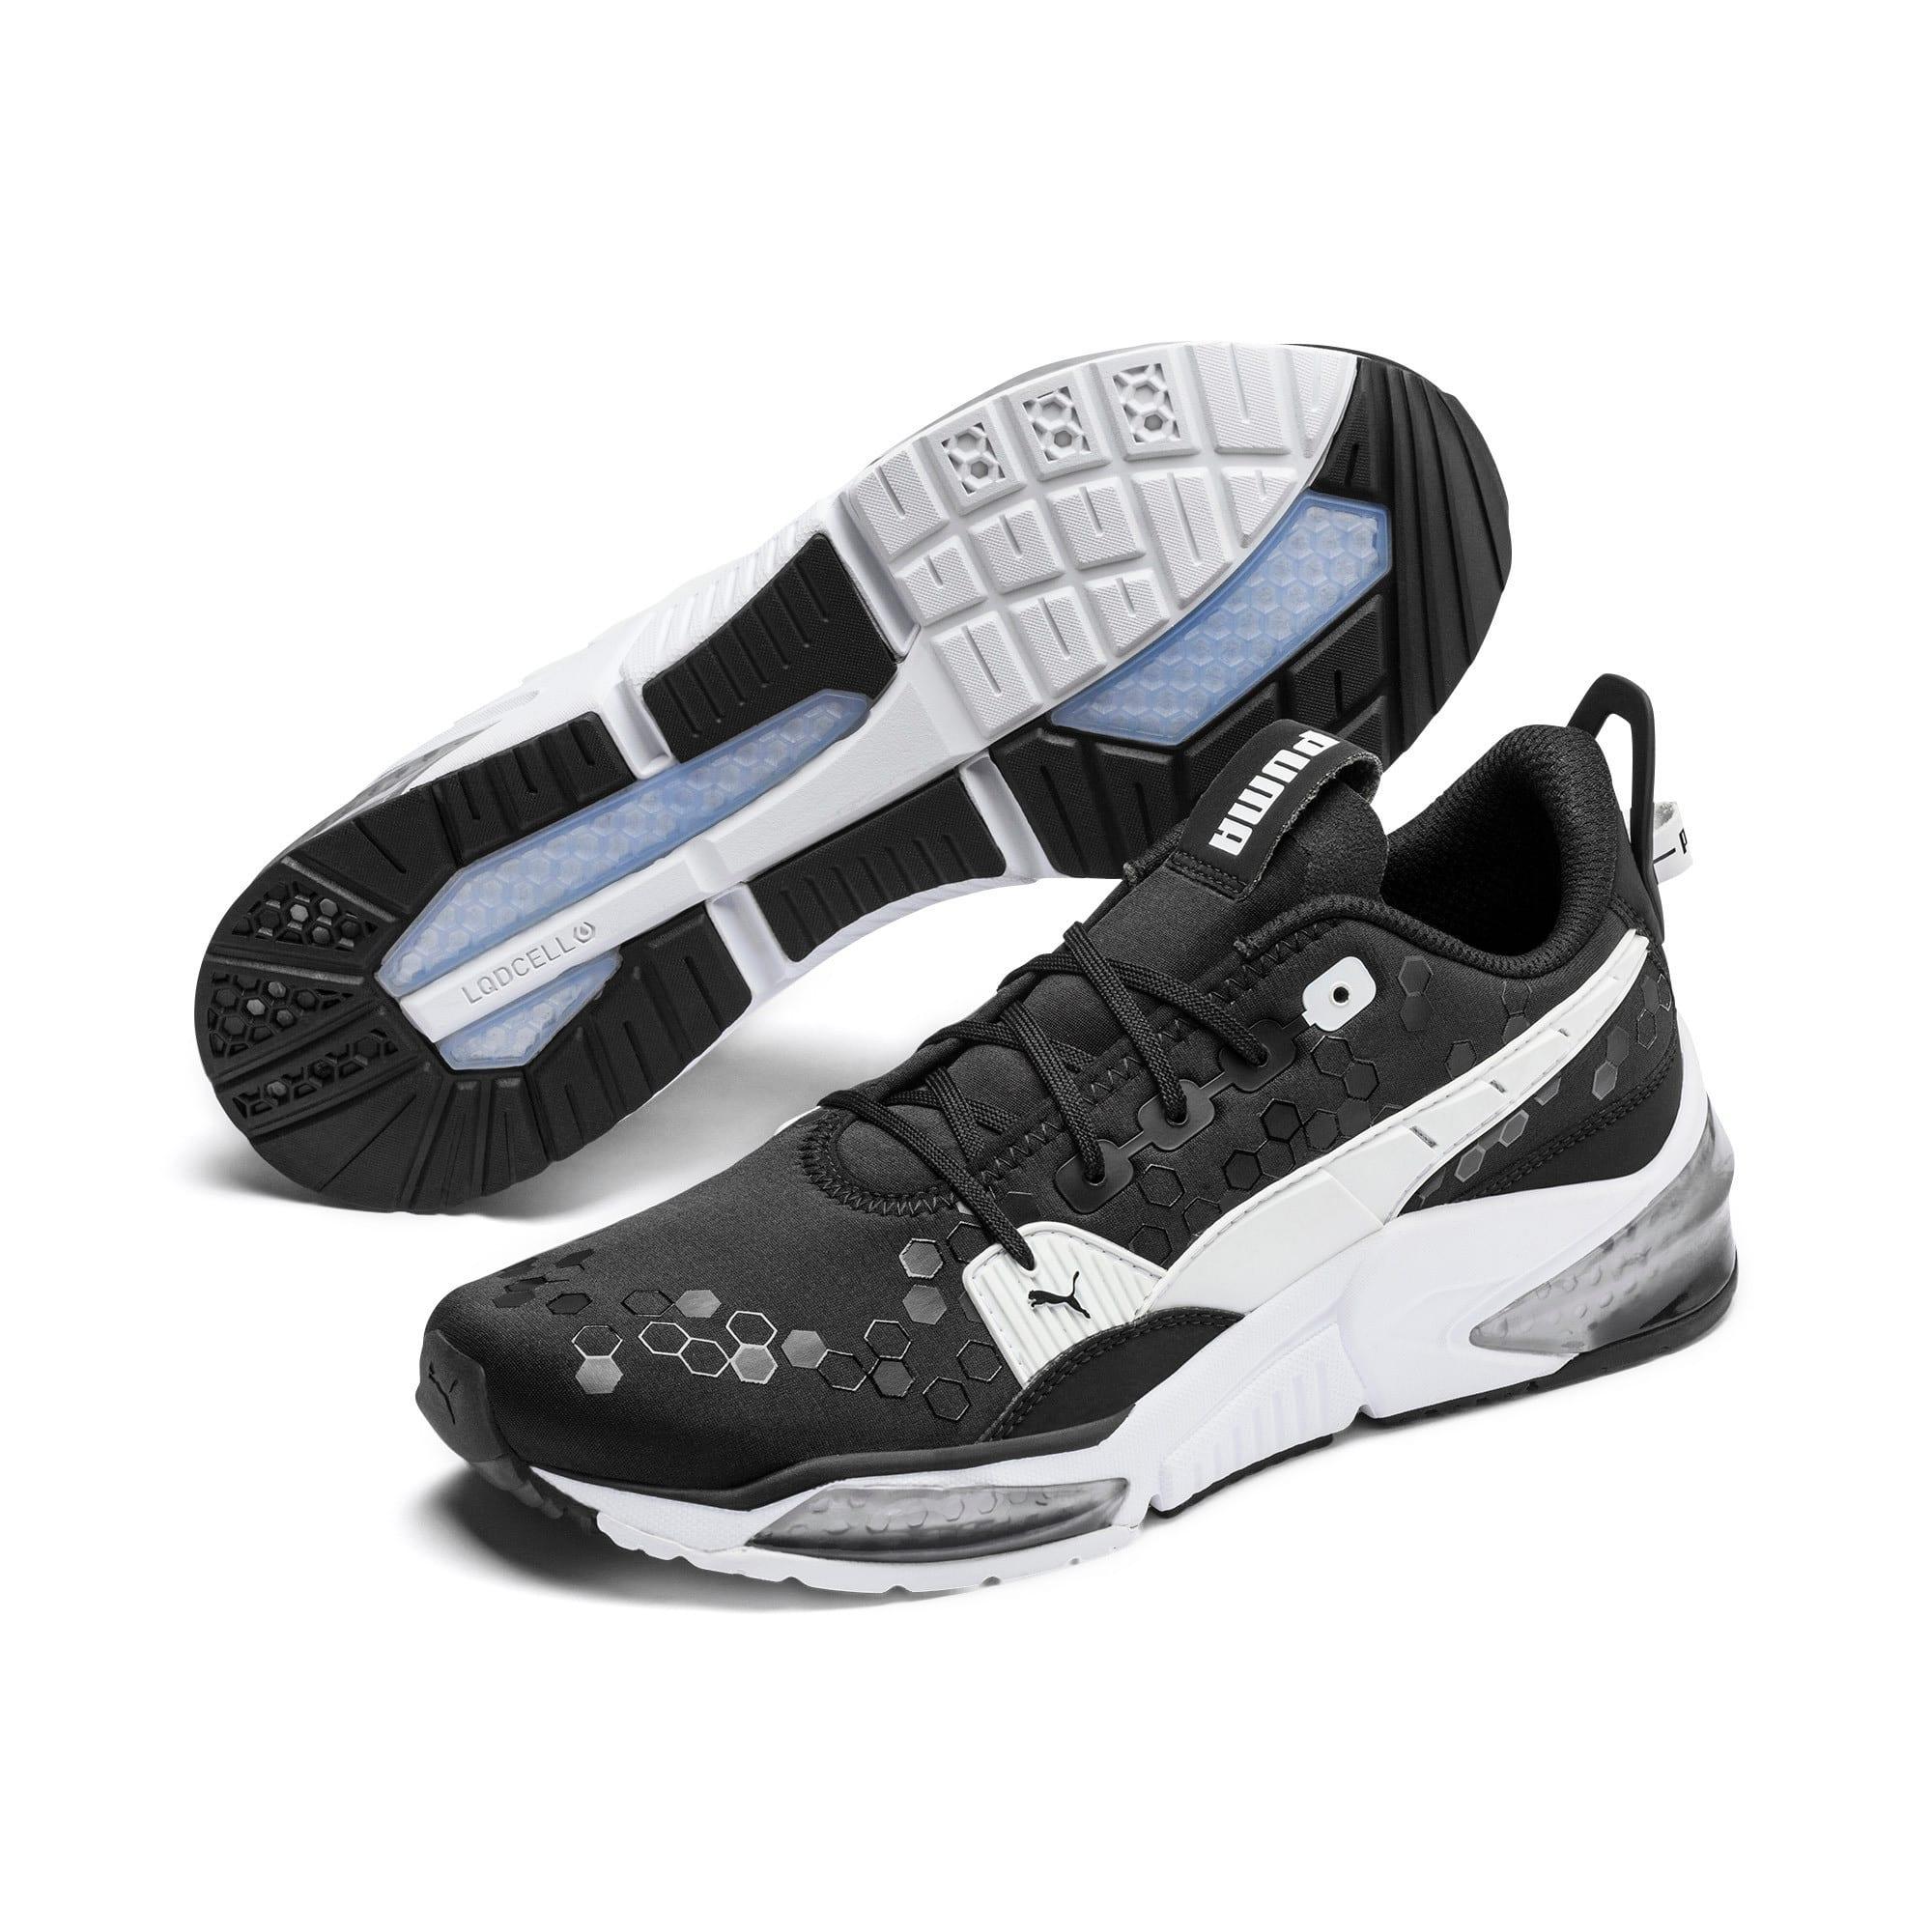 Thumbnail 3 of LQDCELL Optic Training Shoes, Puma Black-Puma White, medium